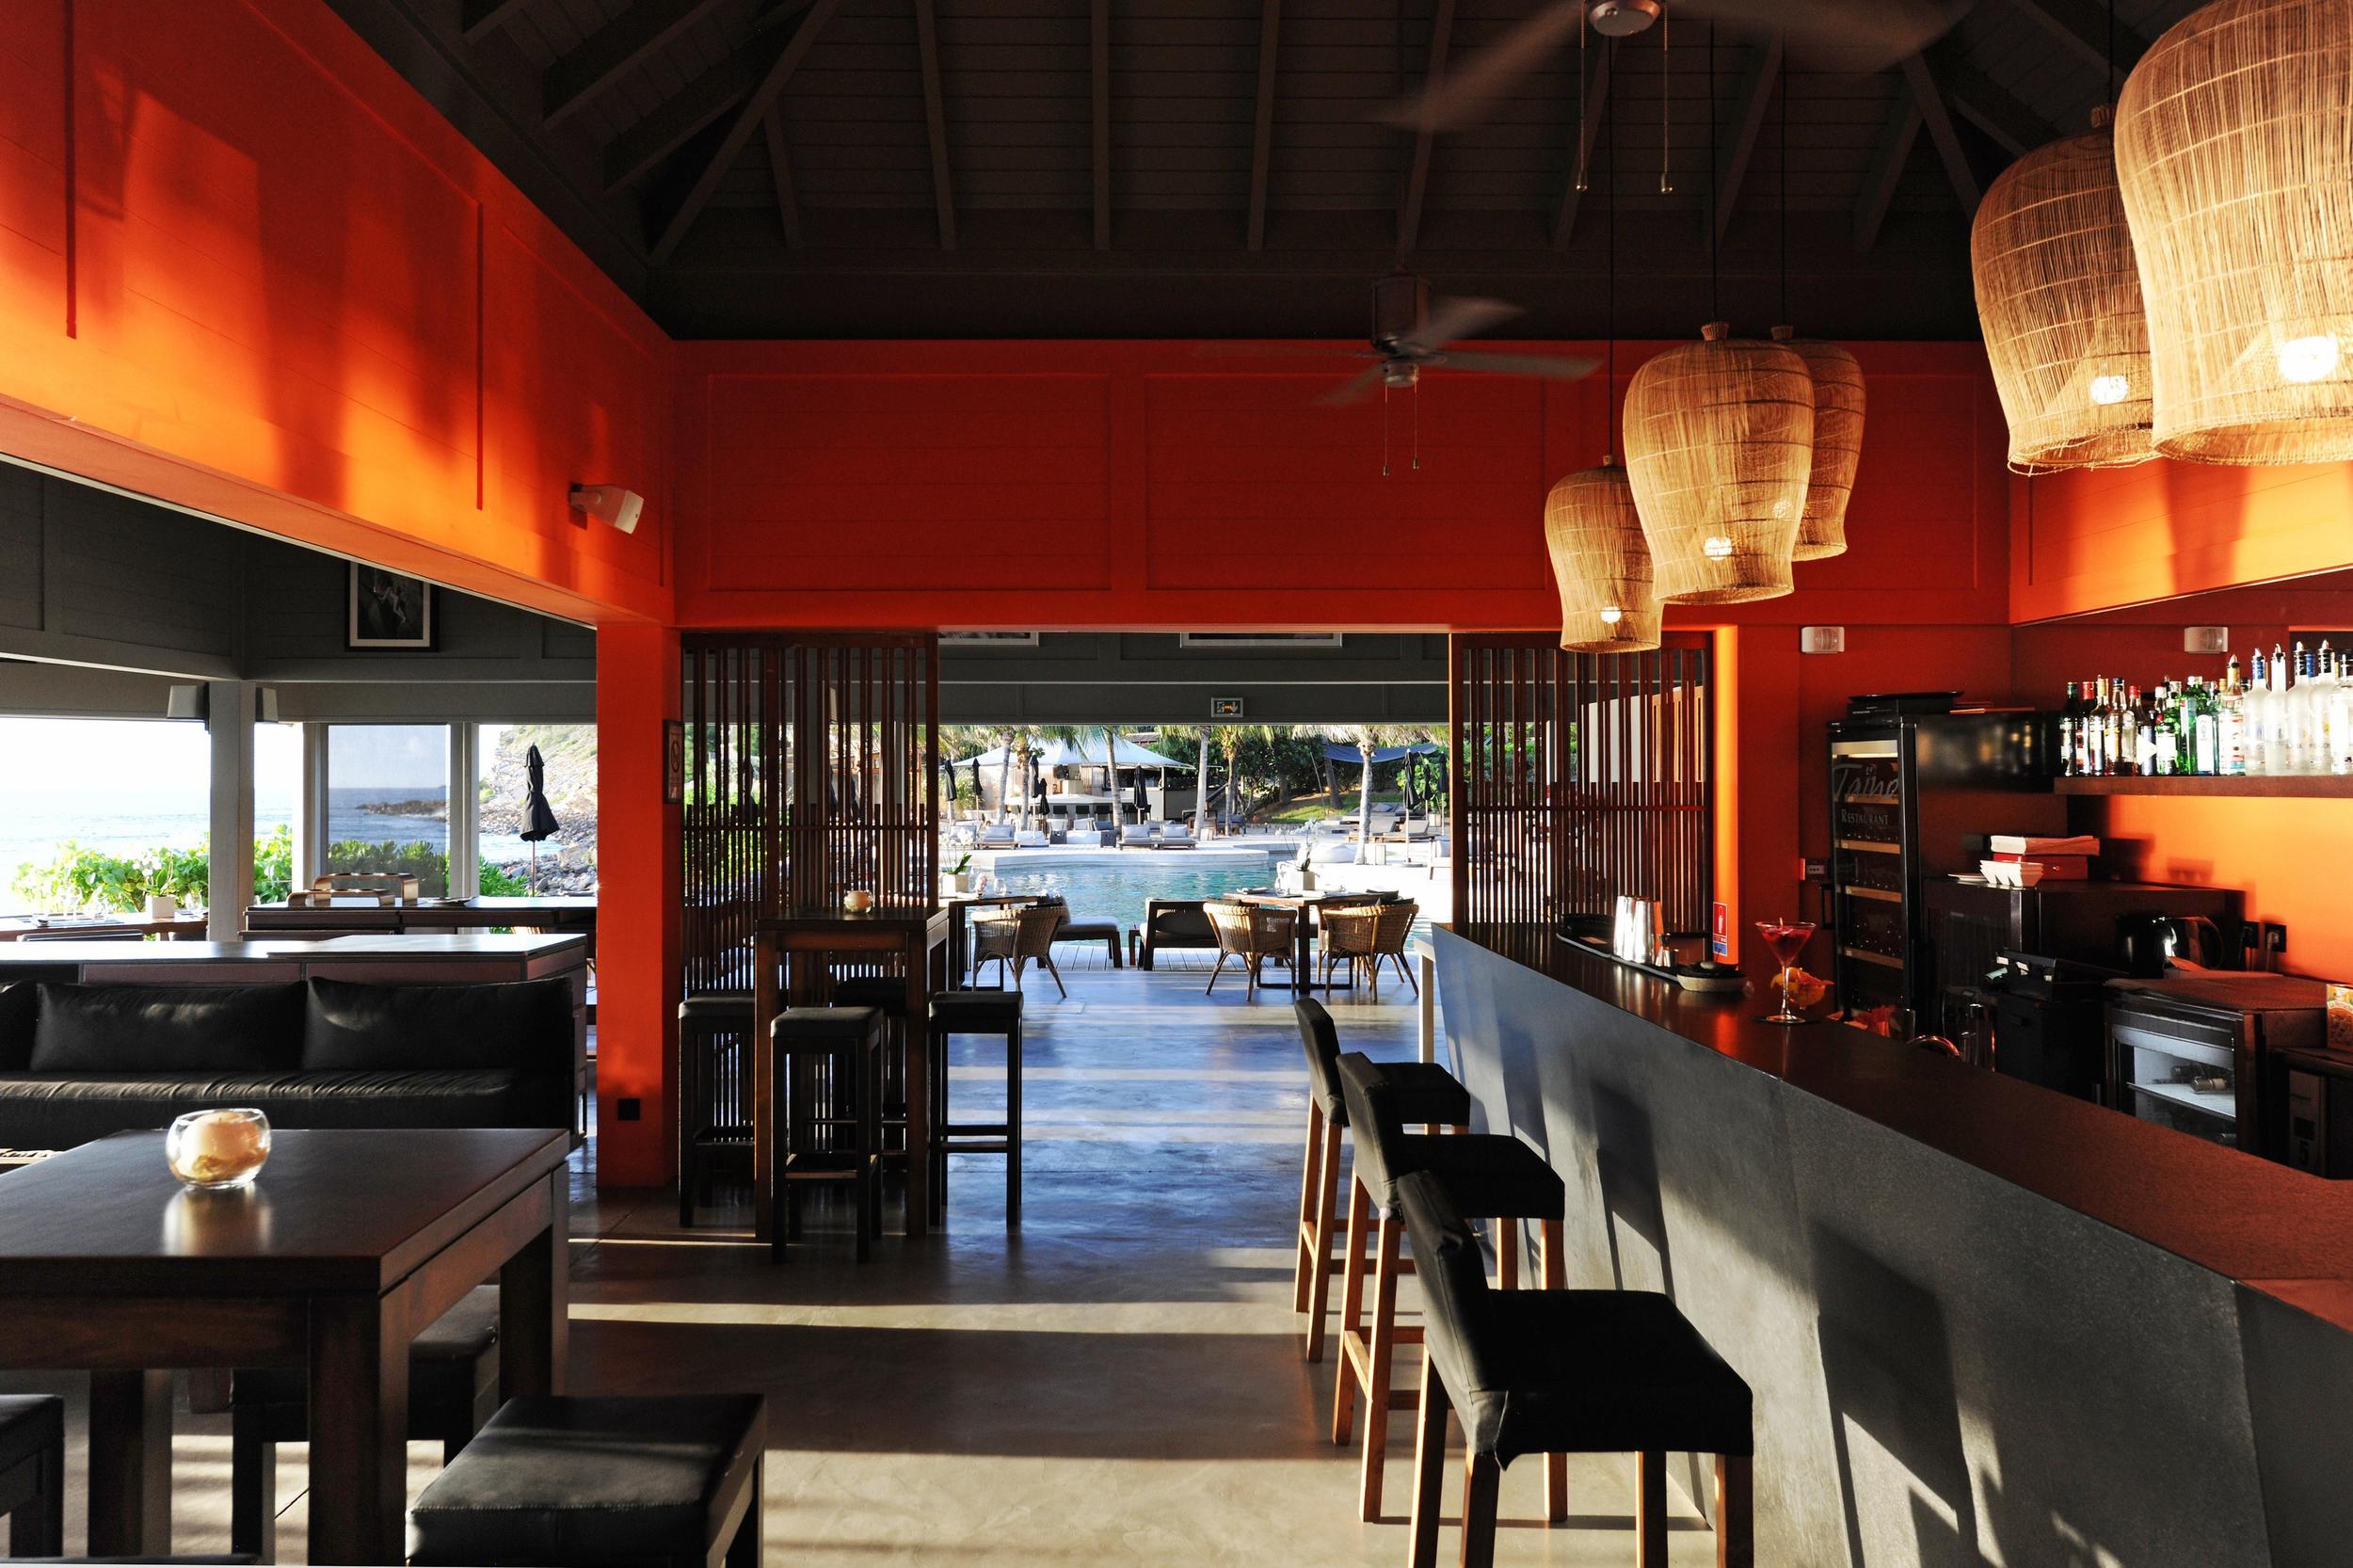 caribbean_StBarths_Hotel_Christopher_Restaurant Taino.jpg